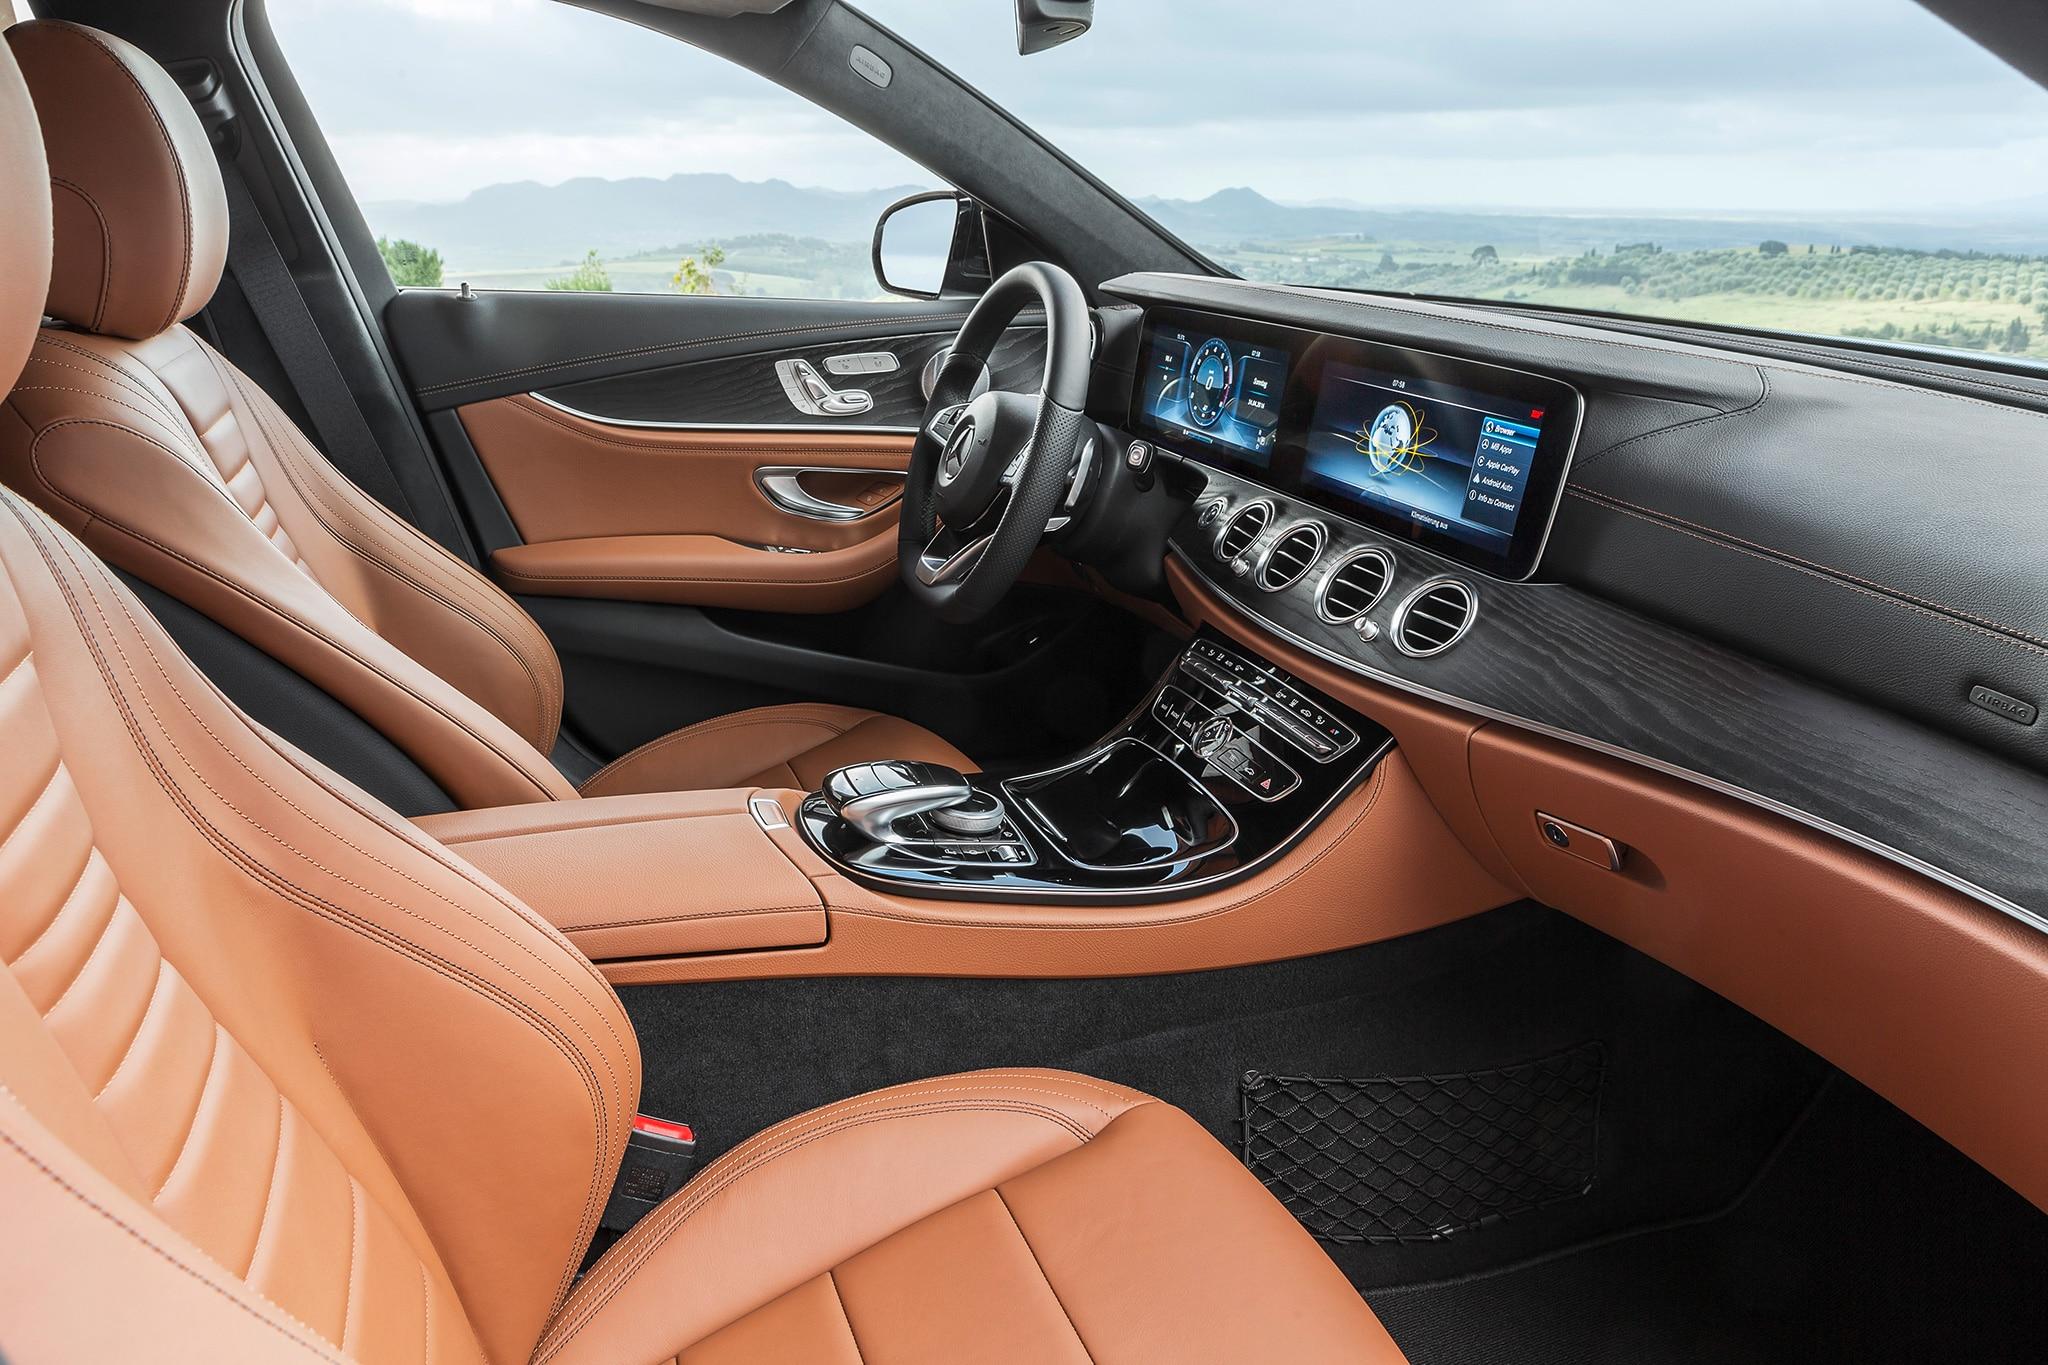 http://st.automobilemag.com/uploads/sites/11/2016/09/2017-Mercedes-Benz-E400-4Matic-wagon-cabin.jpg